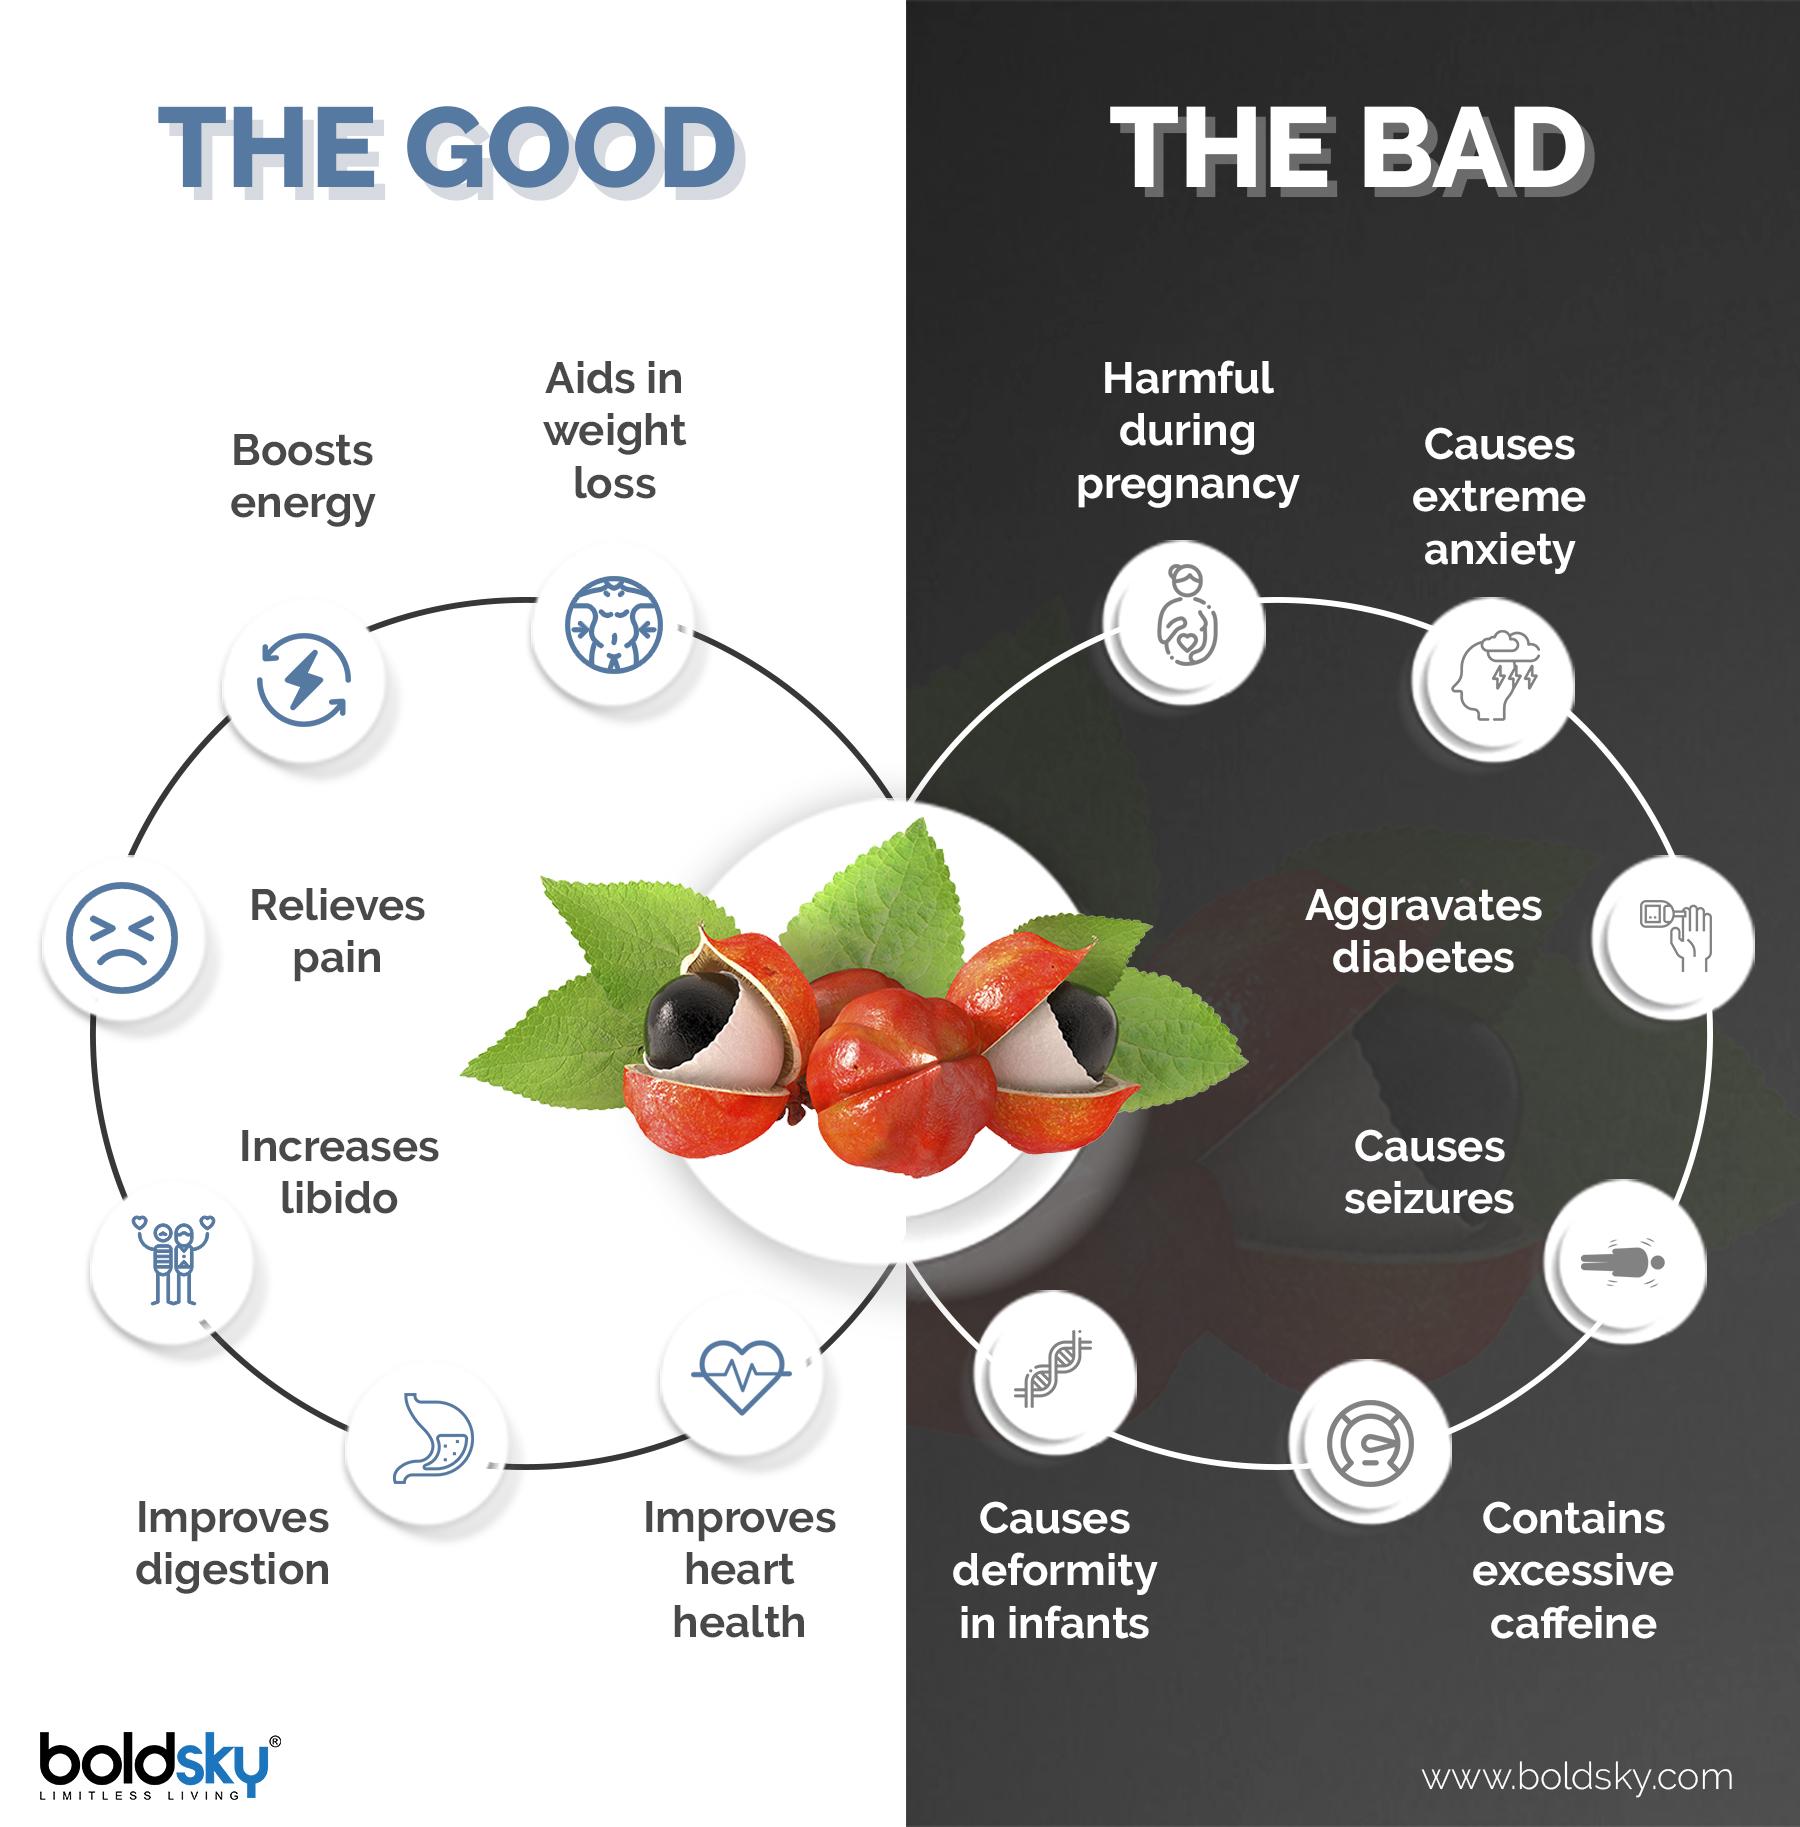 Guarana: Benefits And Caution While Eating - Boldsky.com